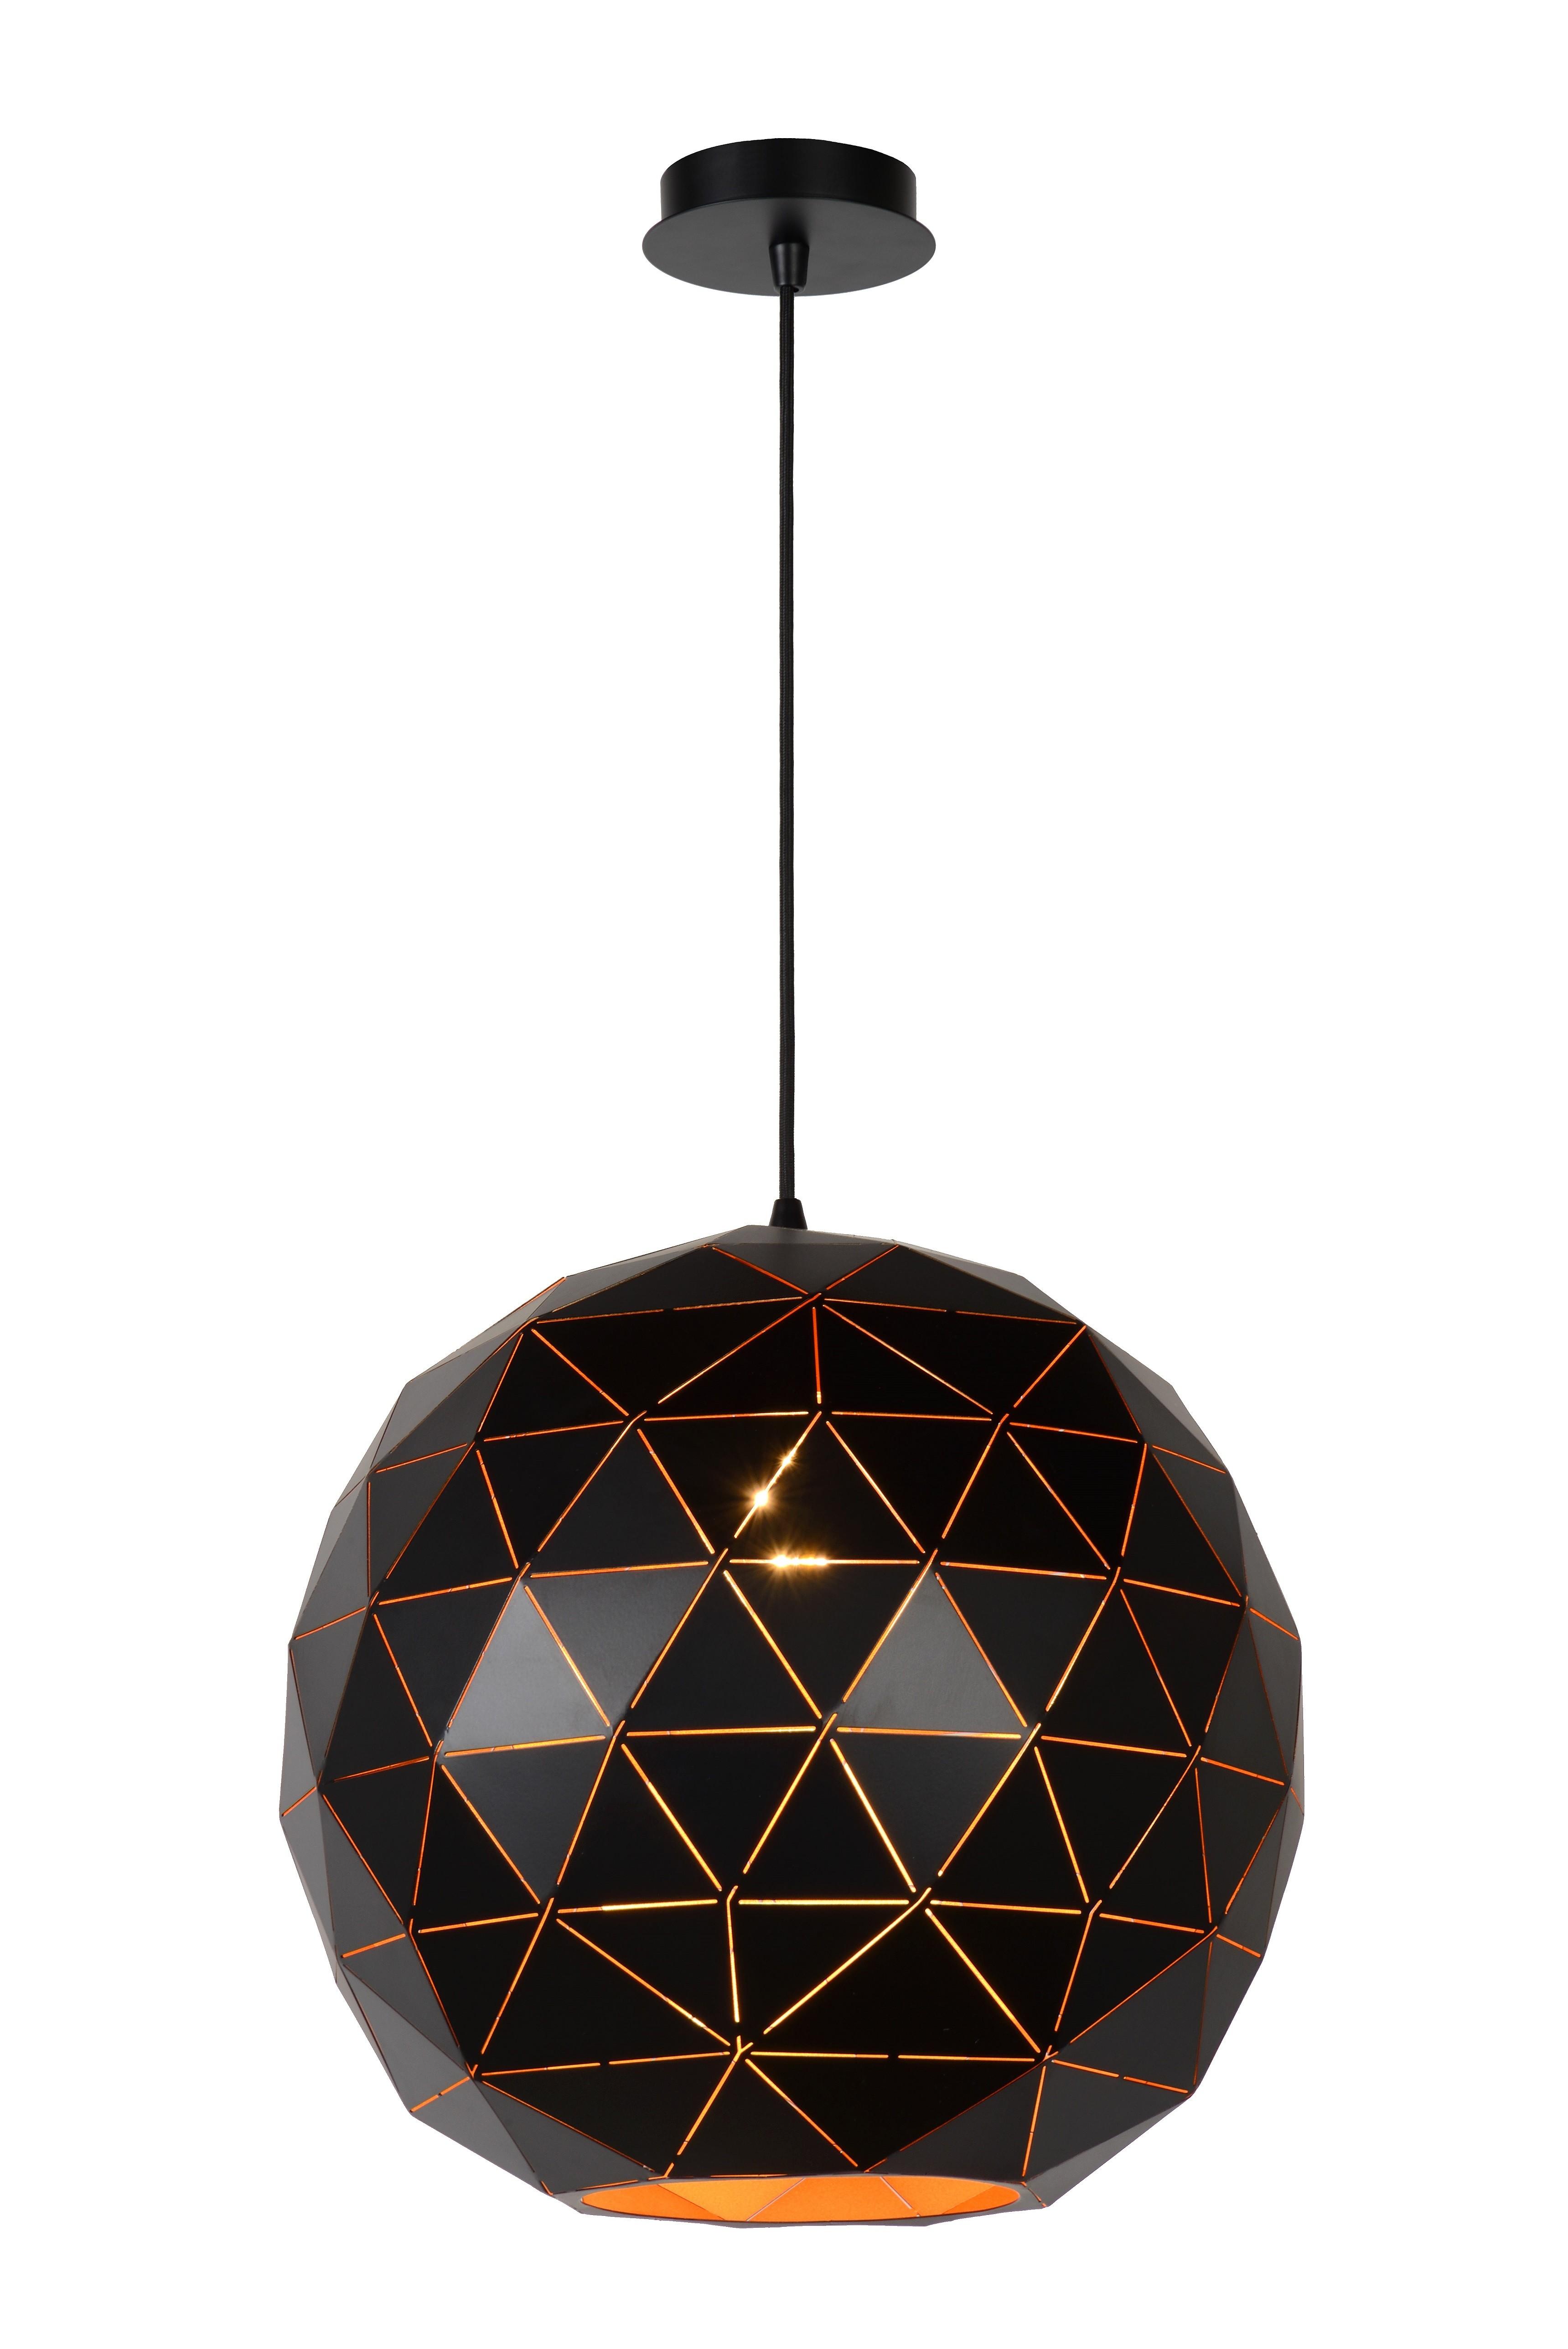 Otona hanglamp zwart goud